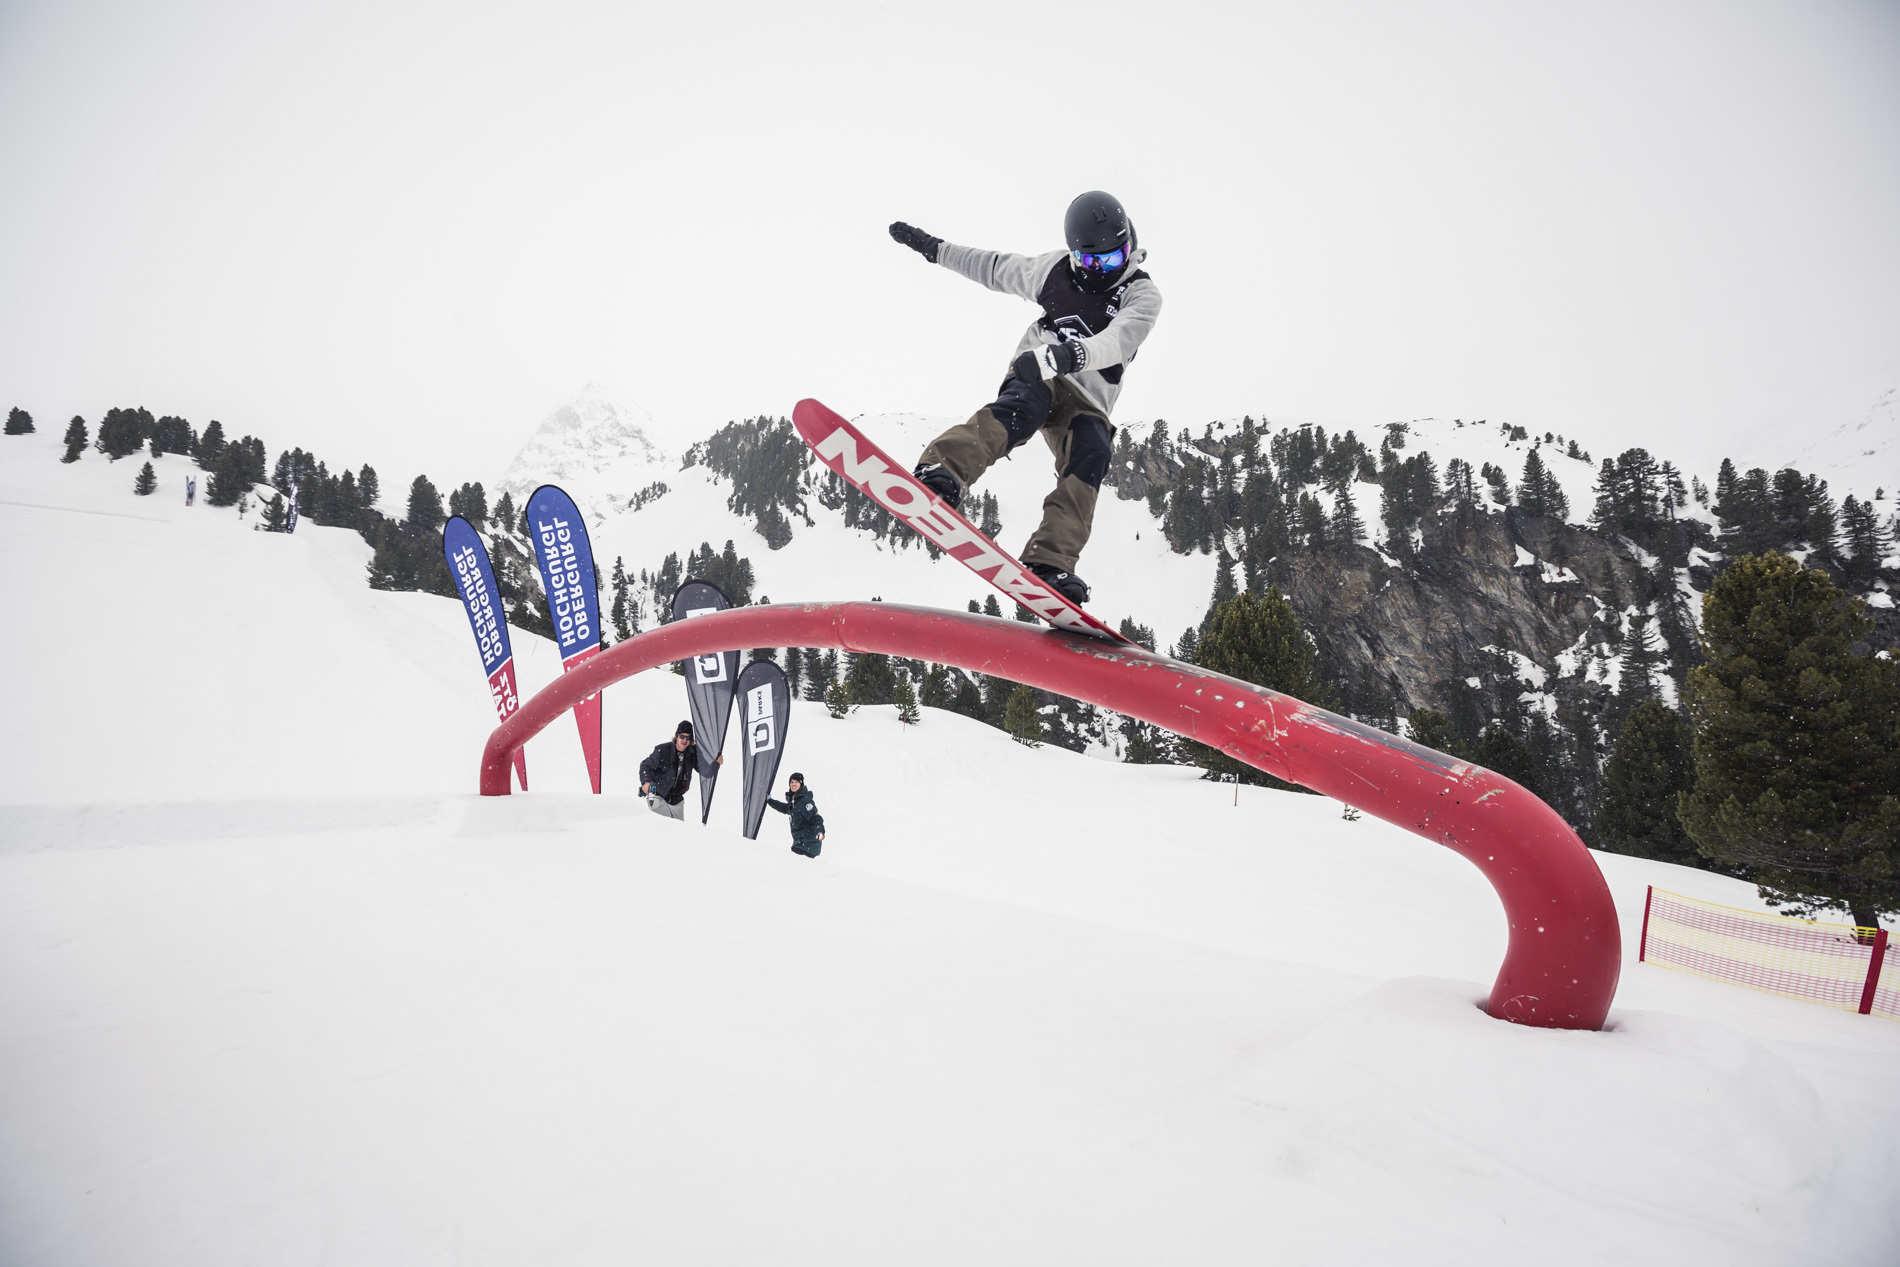 obergurgl tourfinale 15 04 2018 roland haschka qparks 003